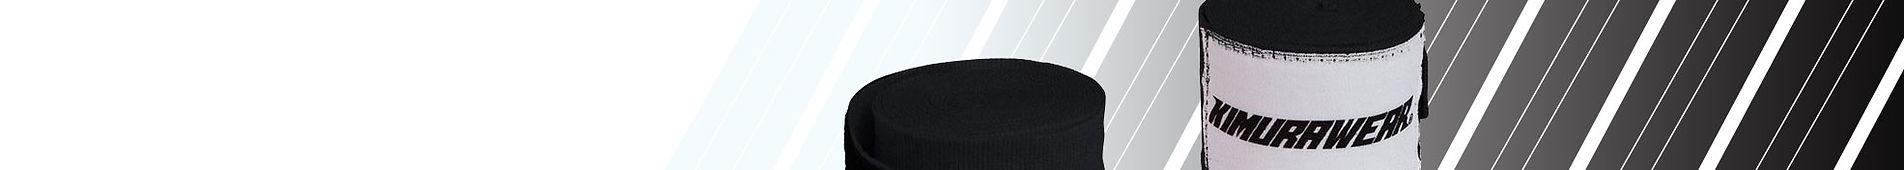 Hand-Wrap-Banner.jpg